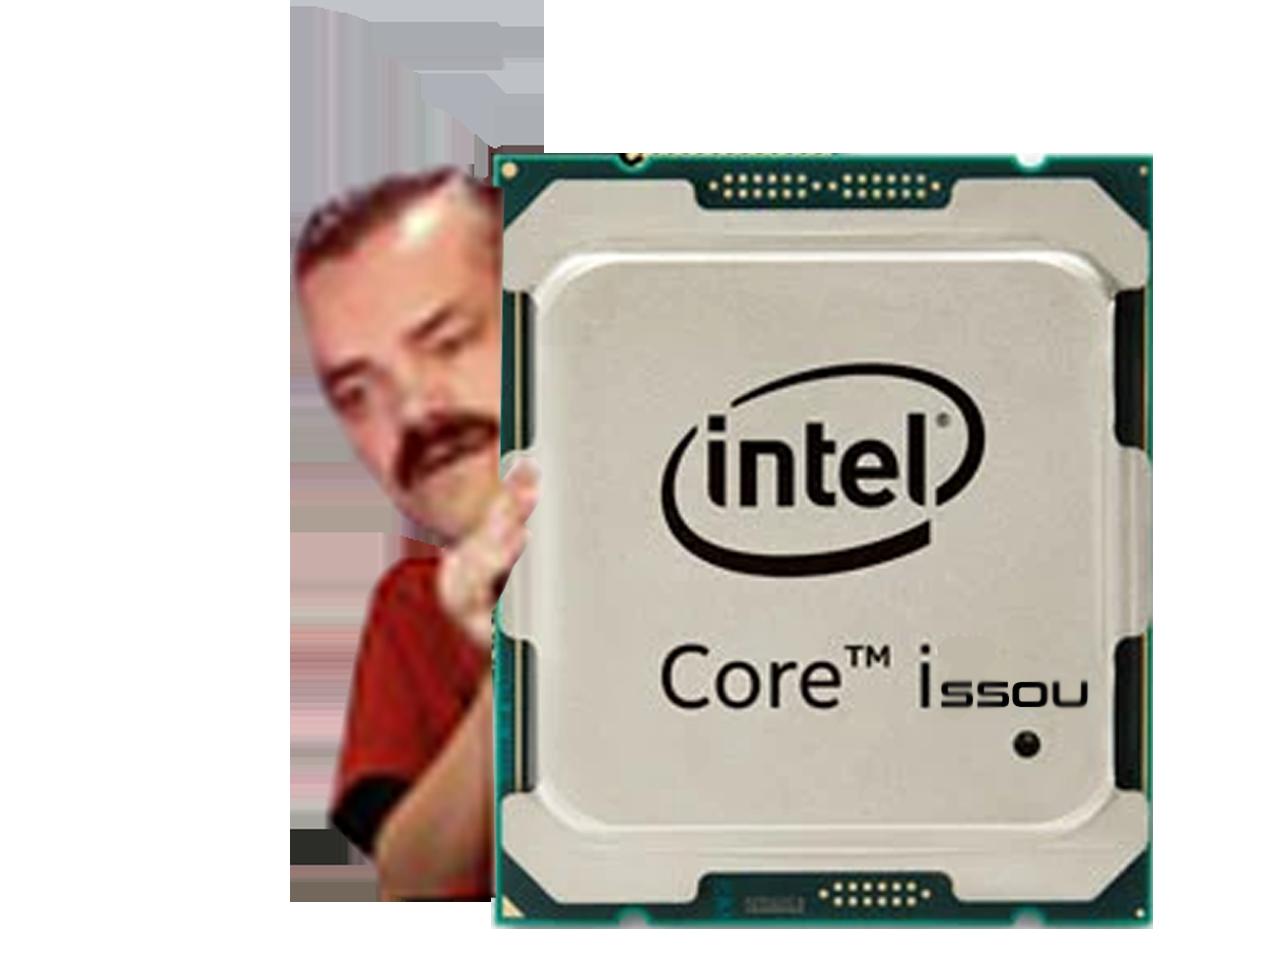 Sticker risitas i7 issou intel core cpu